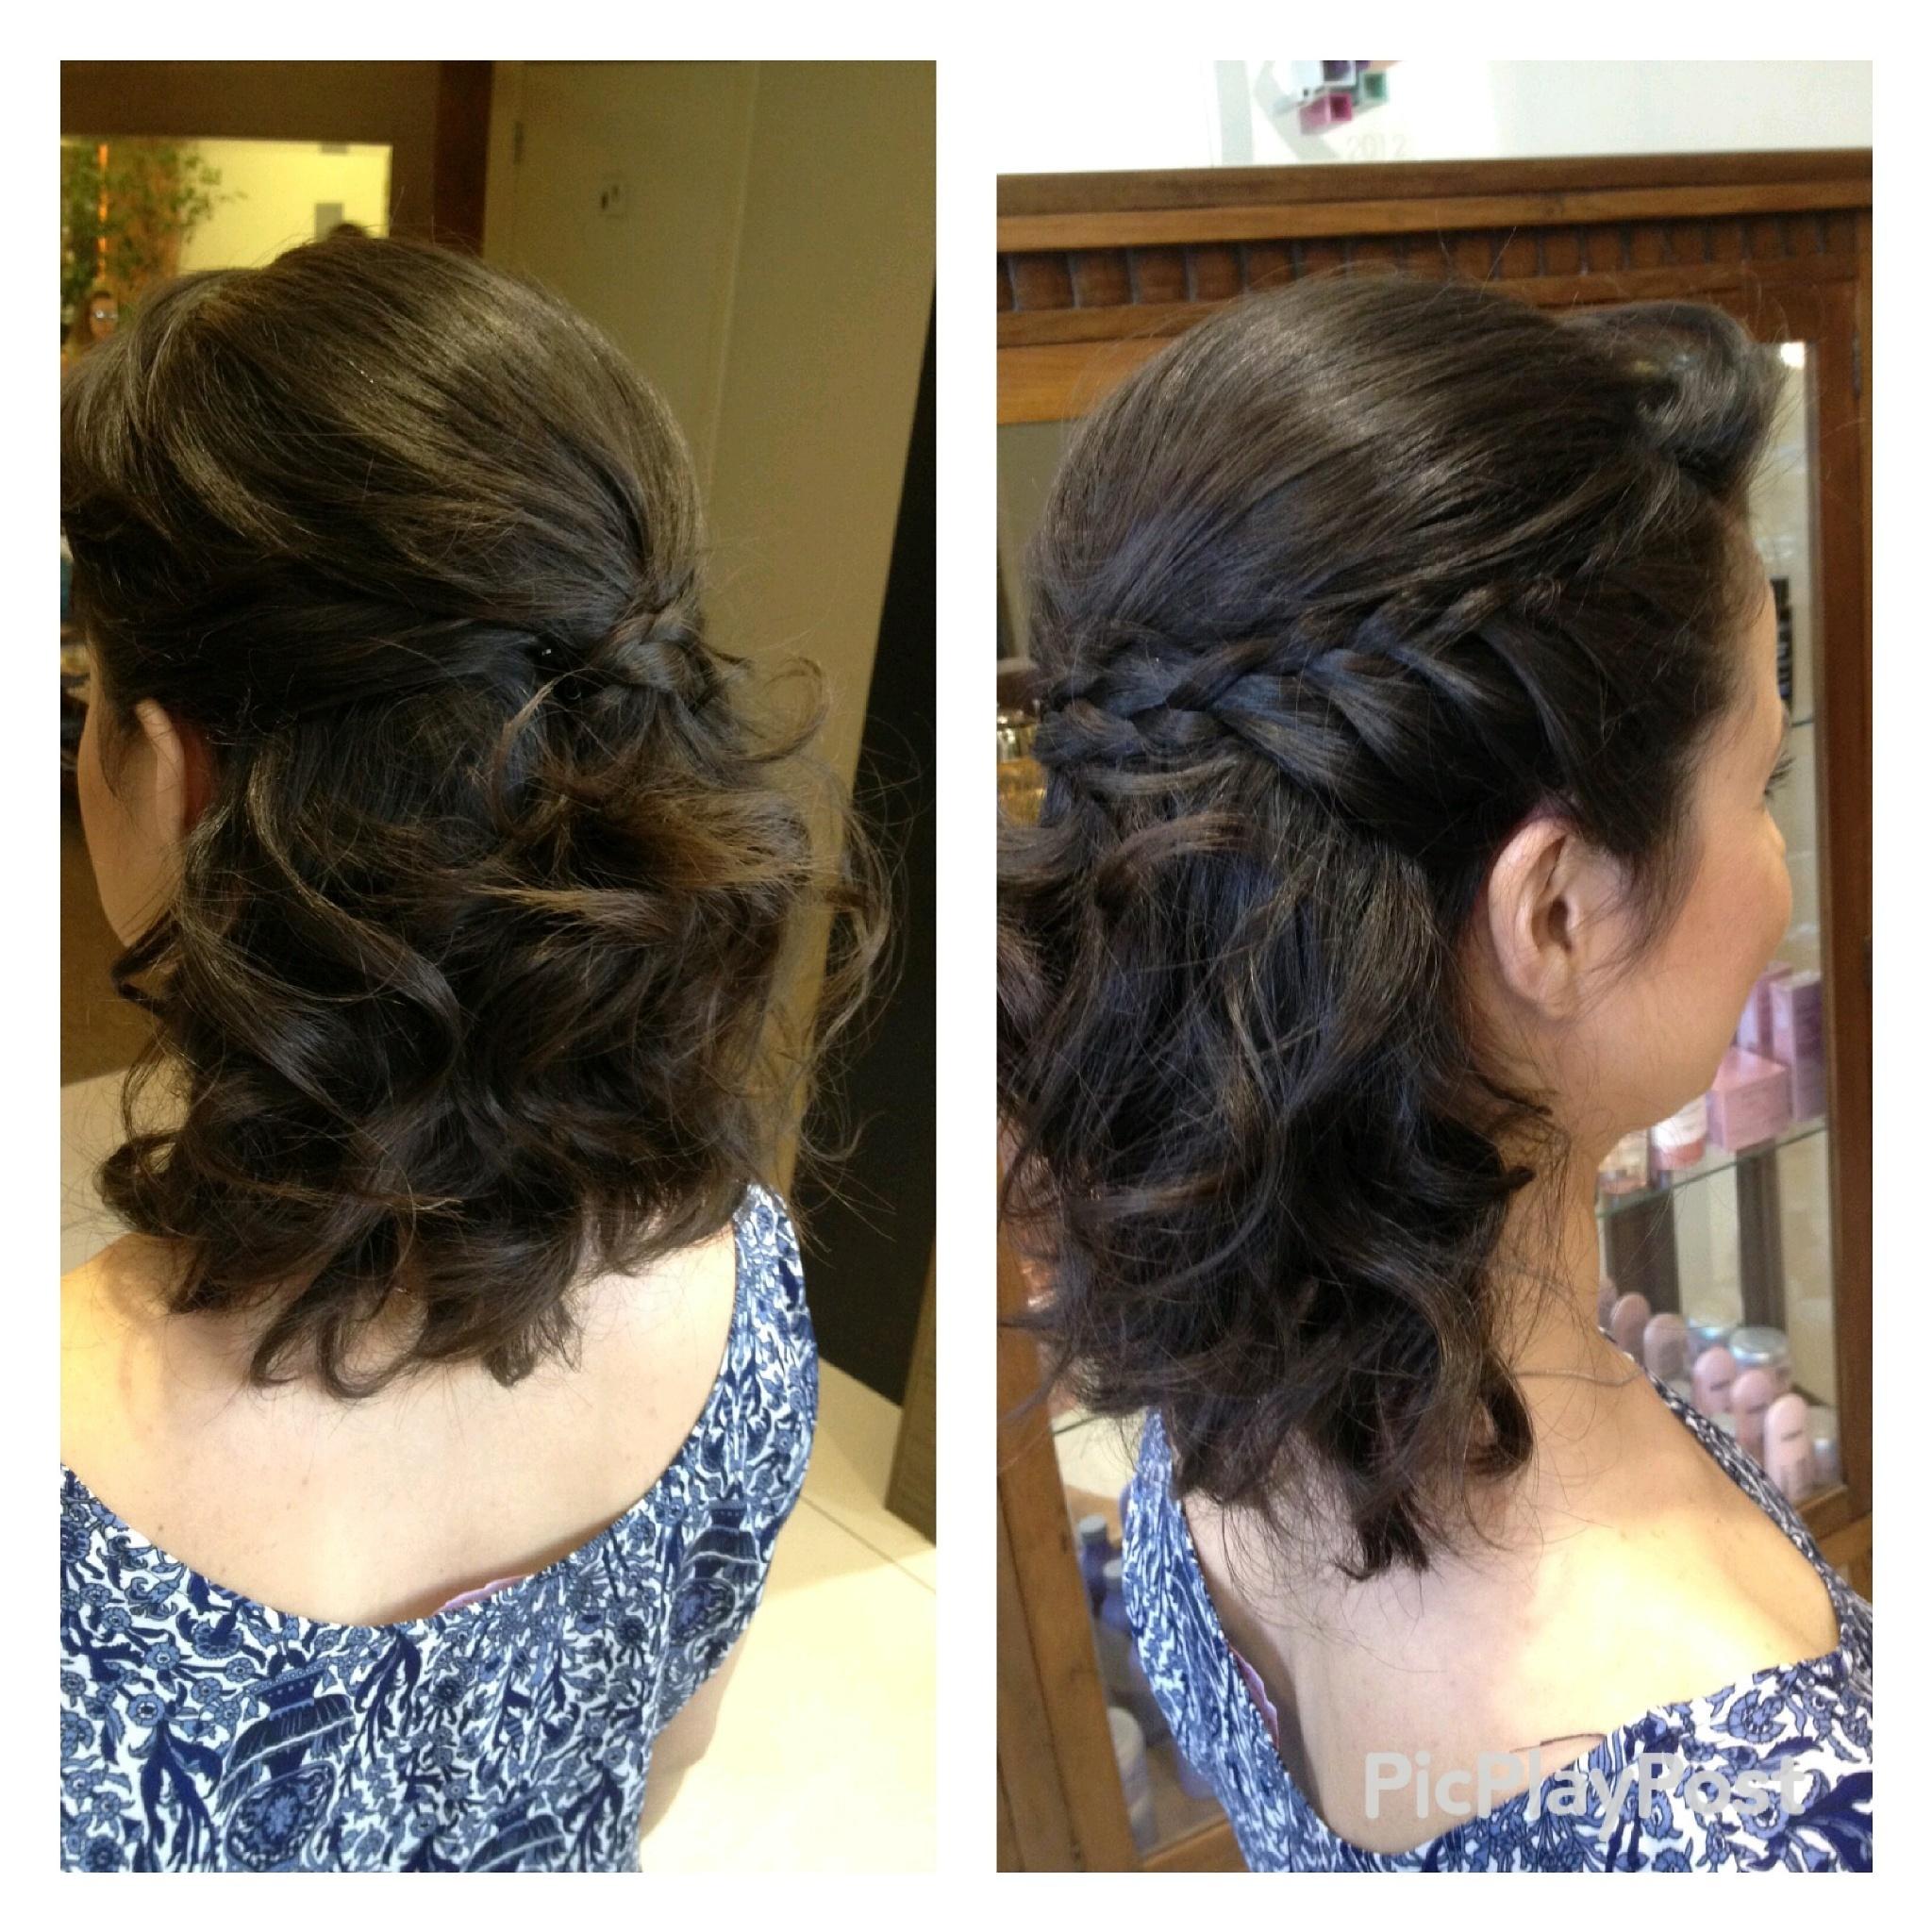 Meio preso #cabelo#penteado#meiopreso#tranca#cabelodefesta#hair#hairdo#amomeutrabalho cabeleireiro(a)